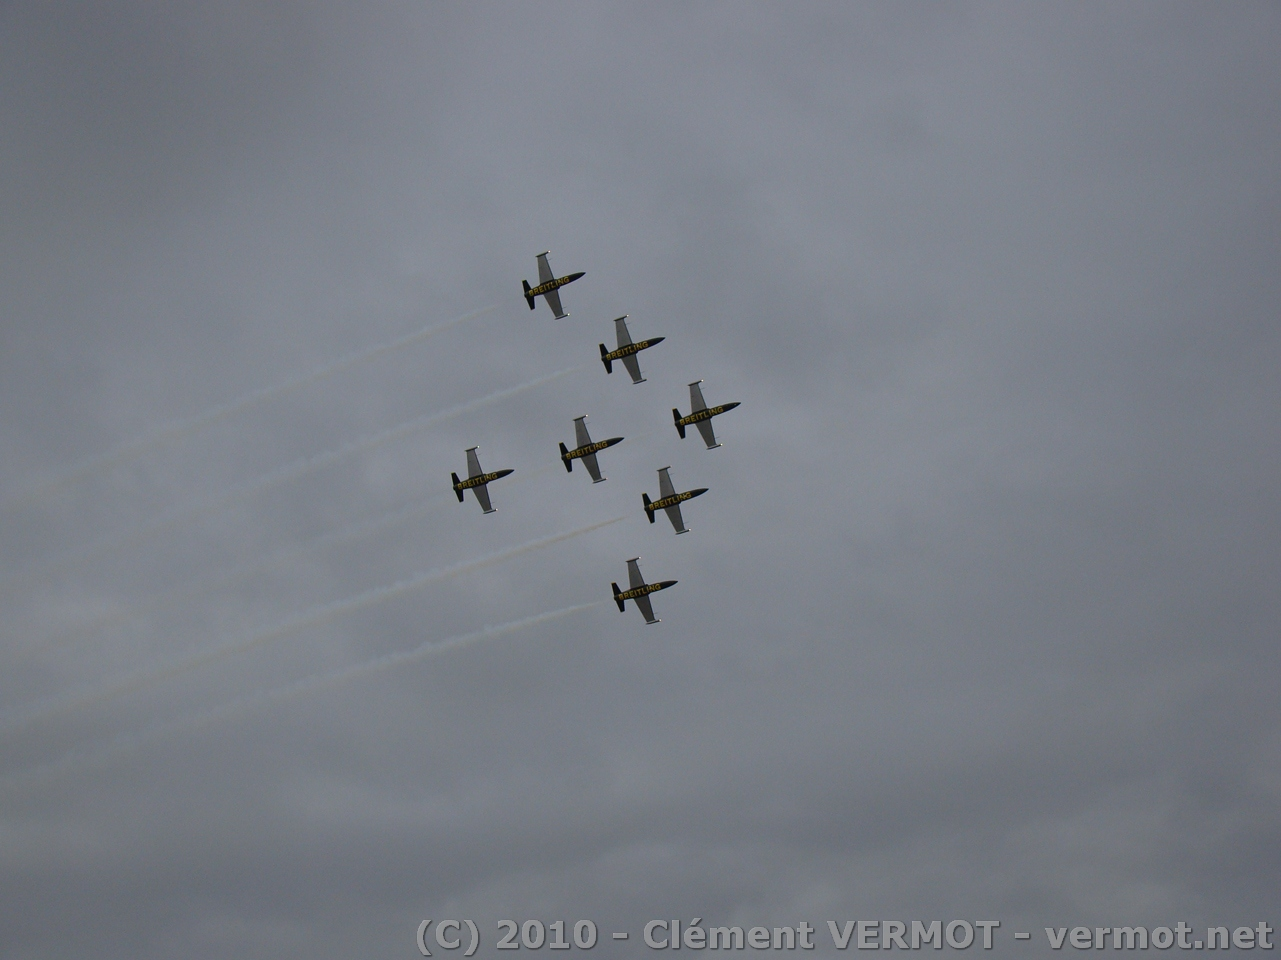 Patrouille Breitling en formation serrée